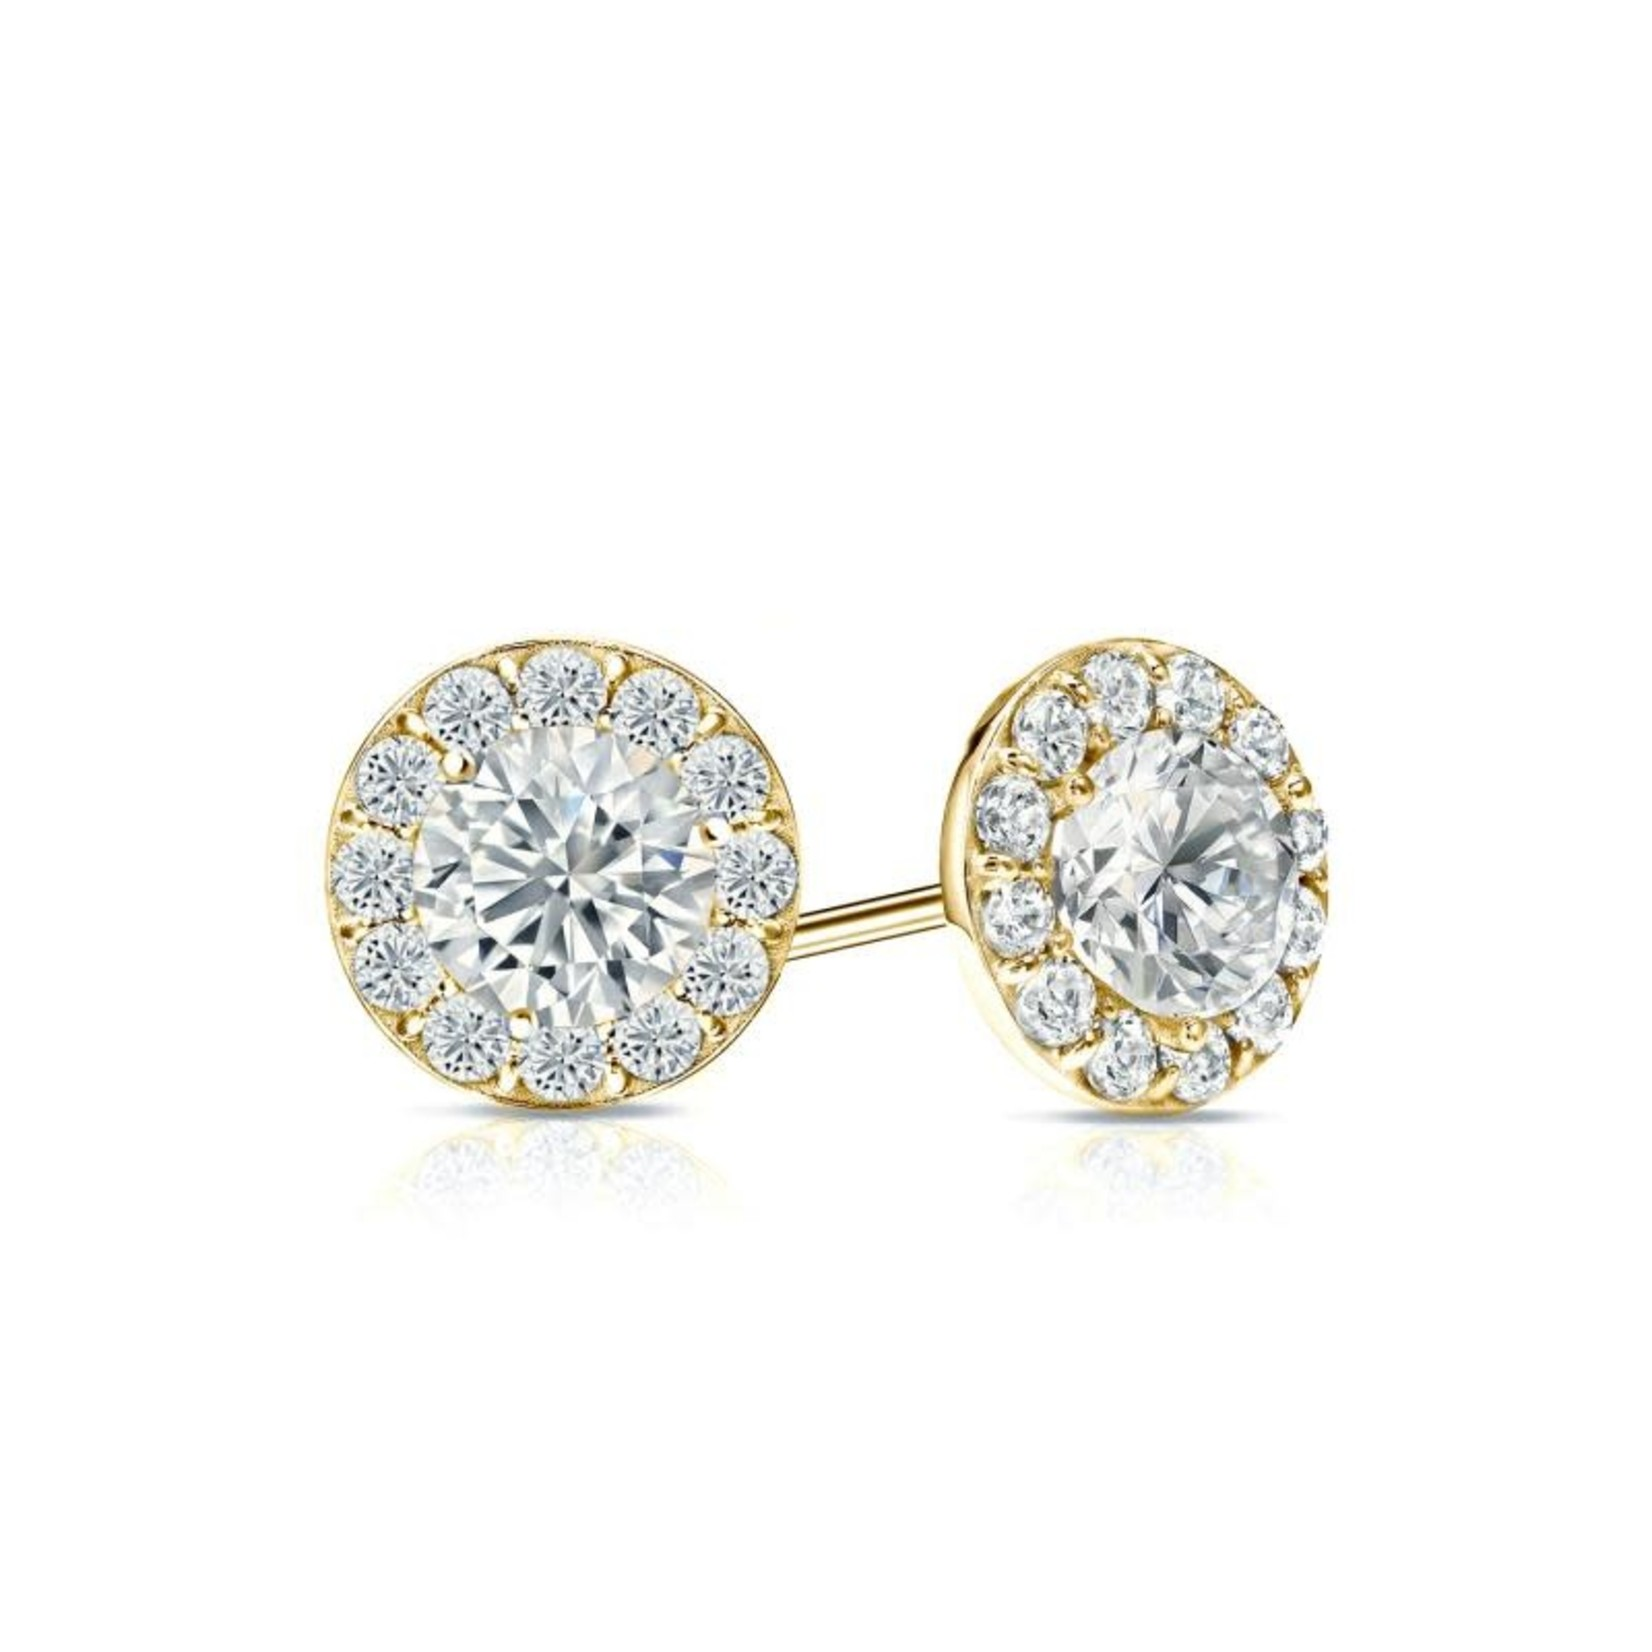 14KY Gold Diamond 1.25ctw Halo Stud Earrings